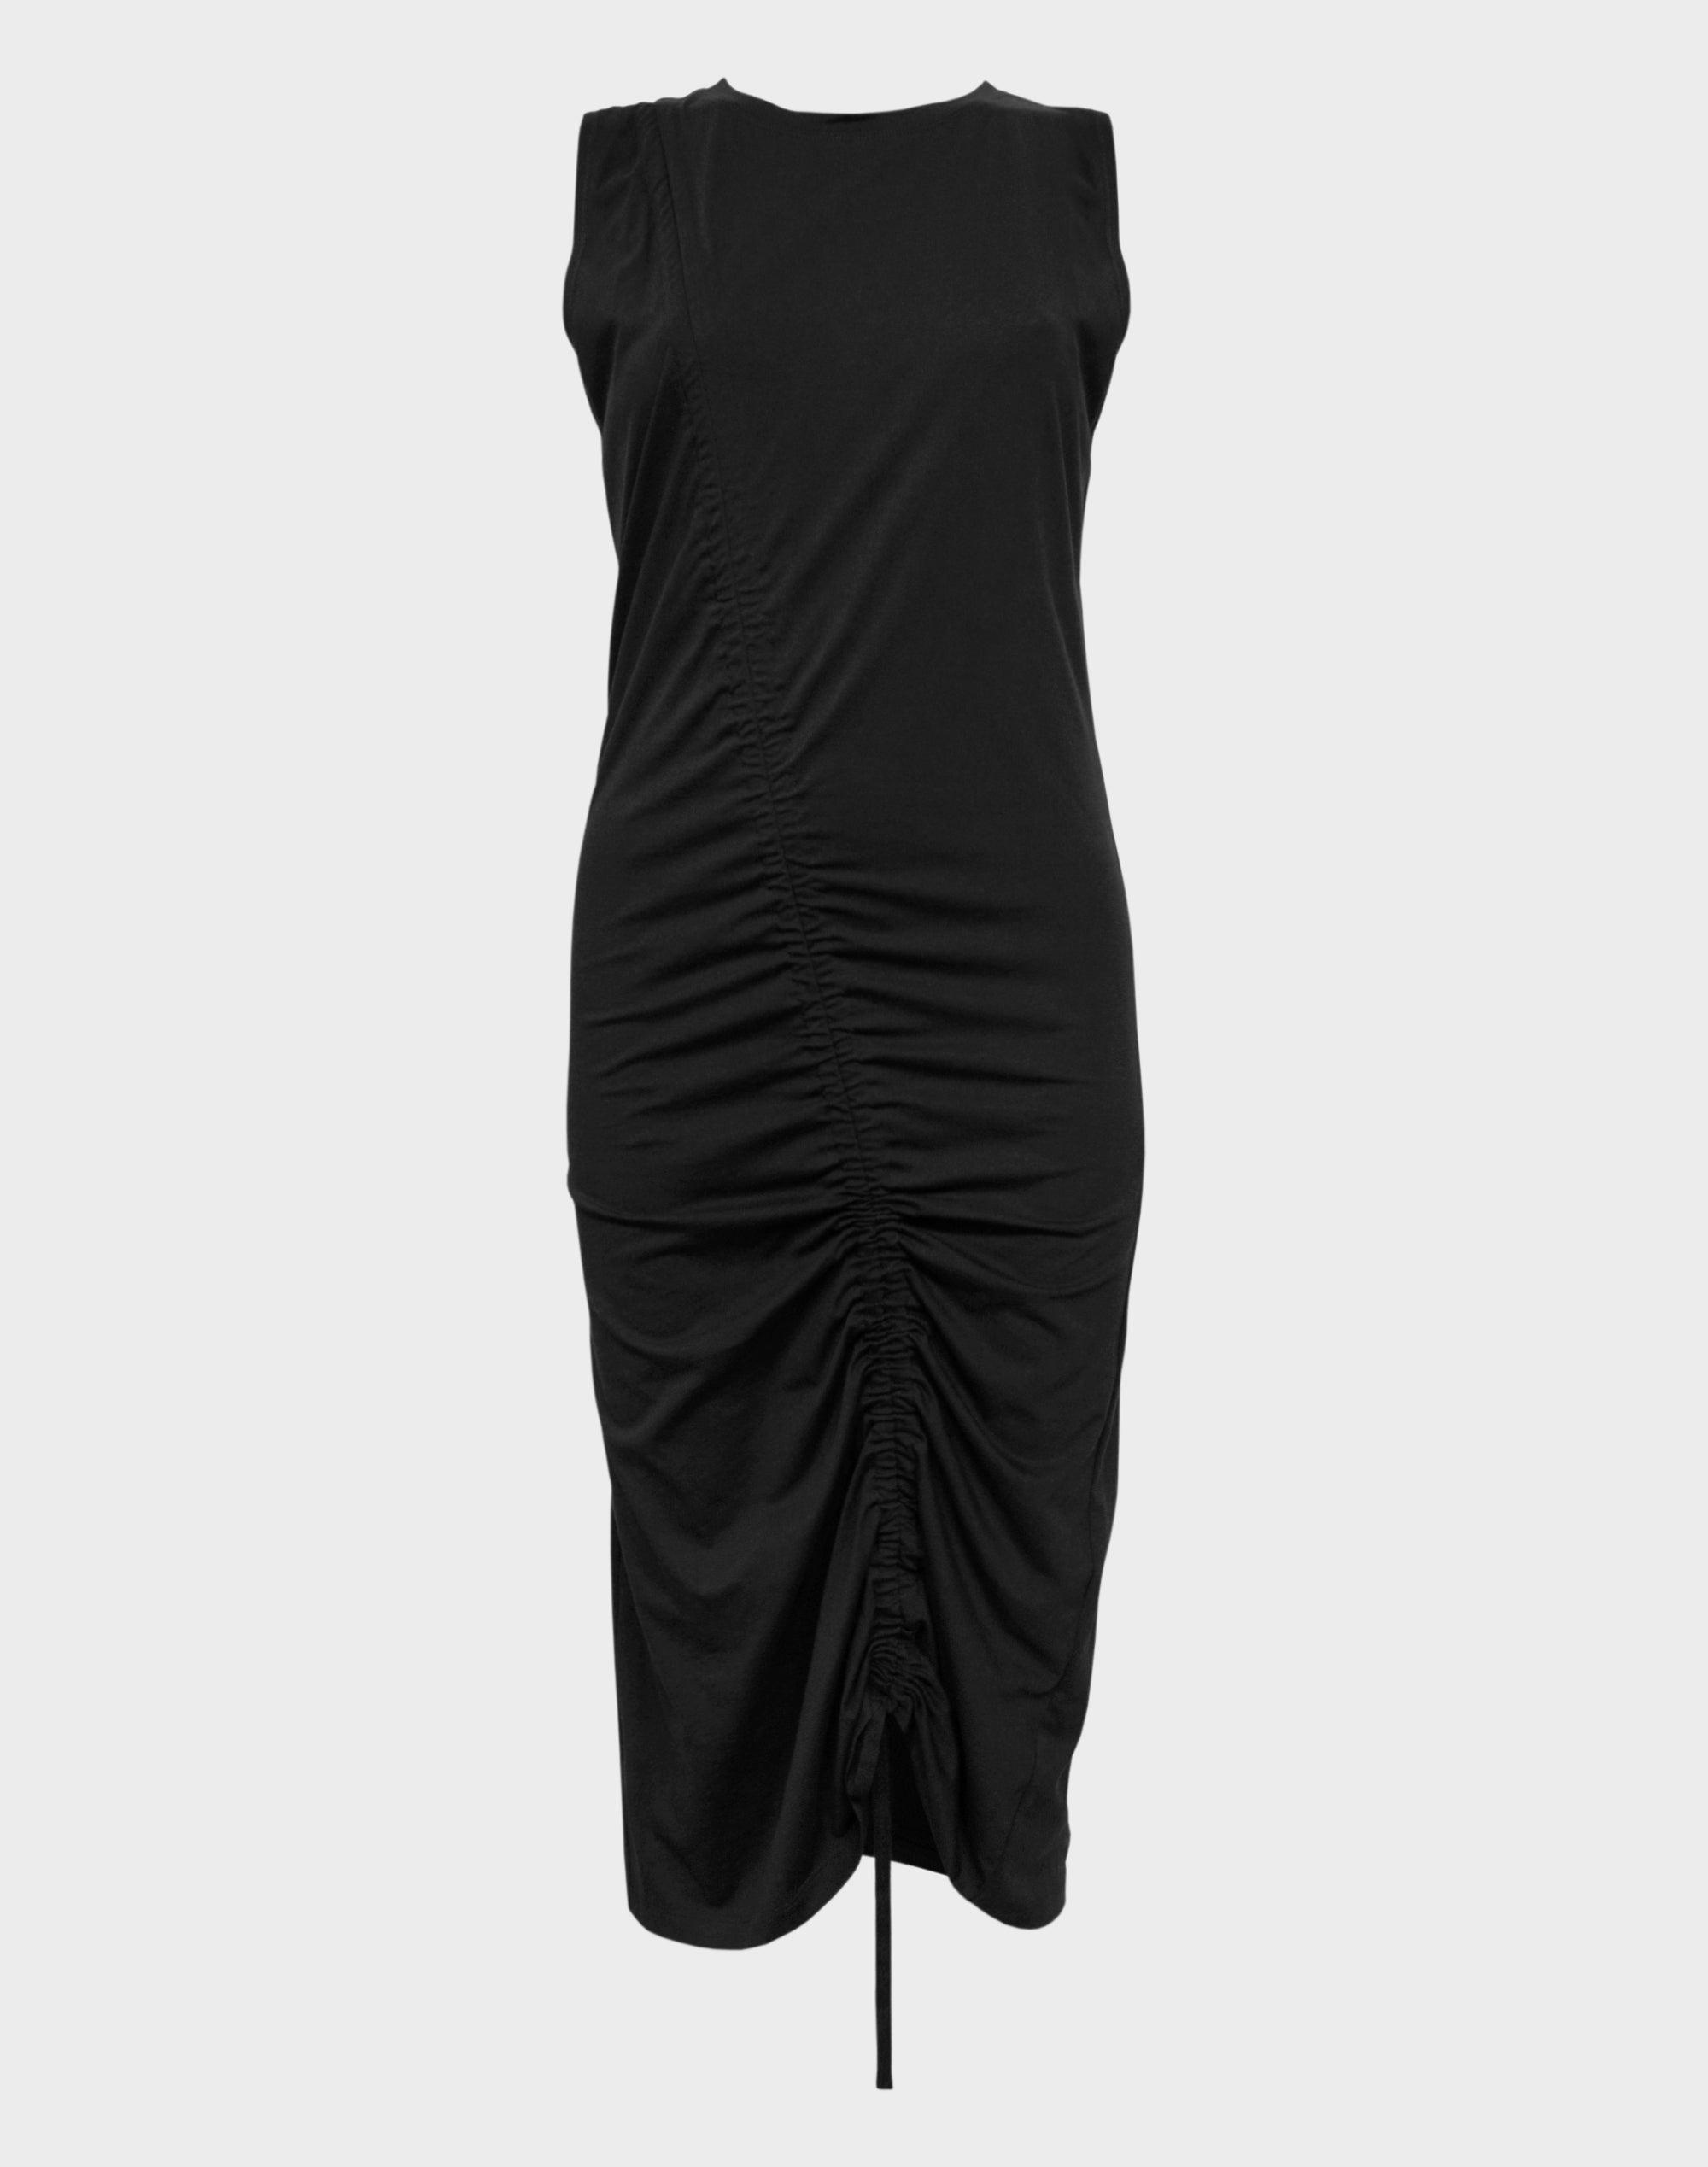 Twisted Knit Dress